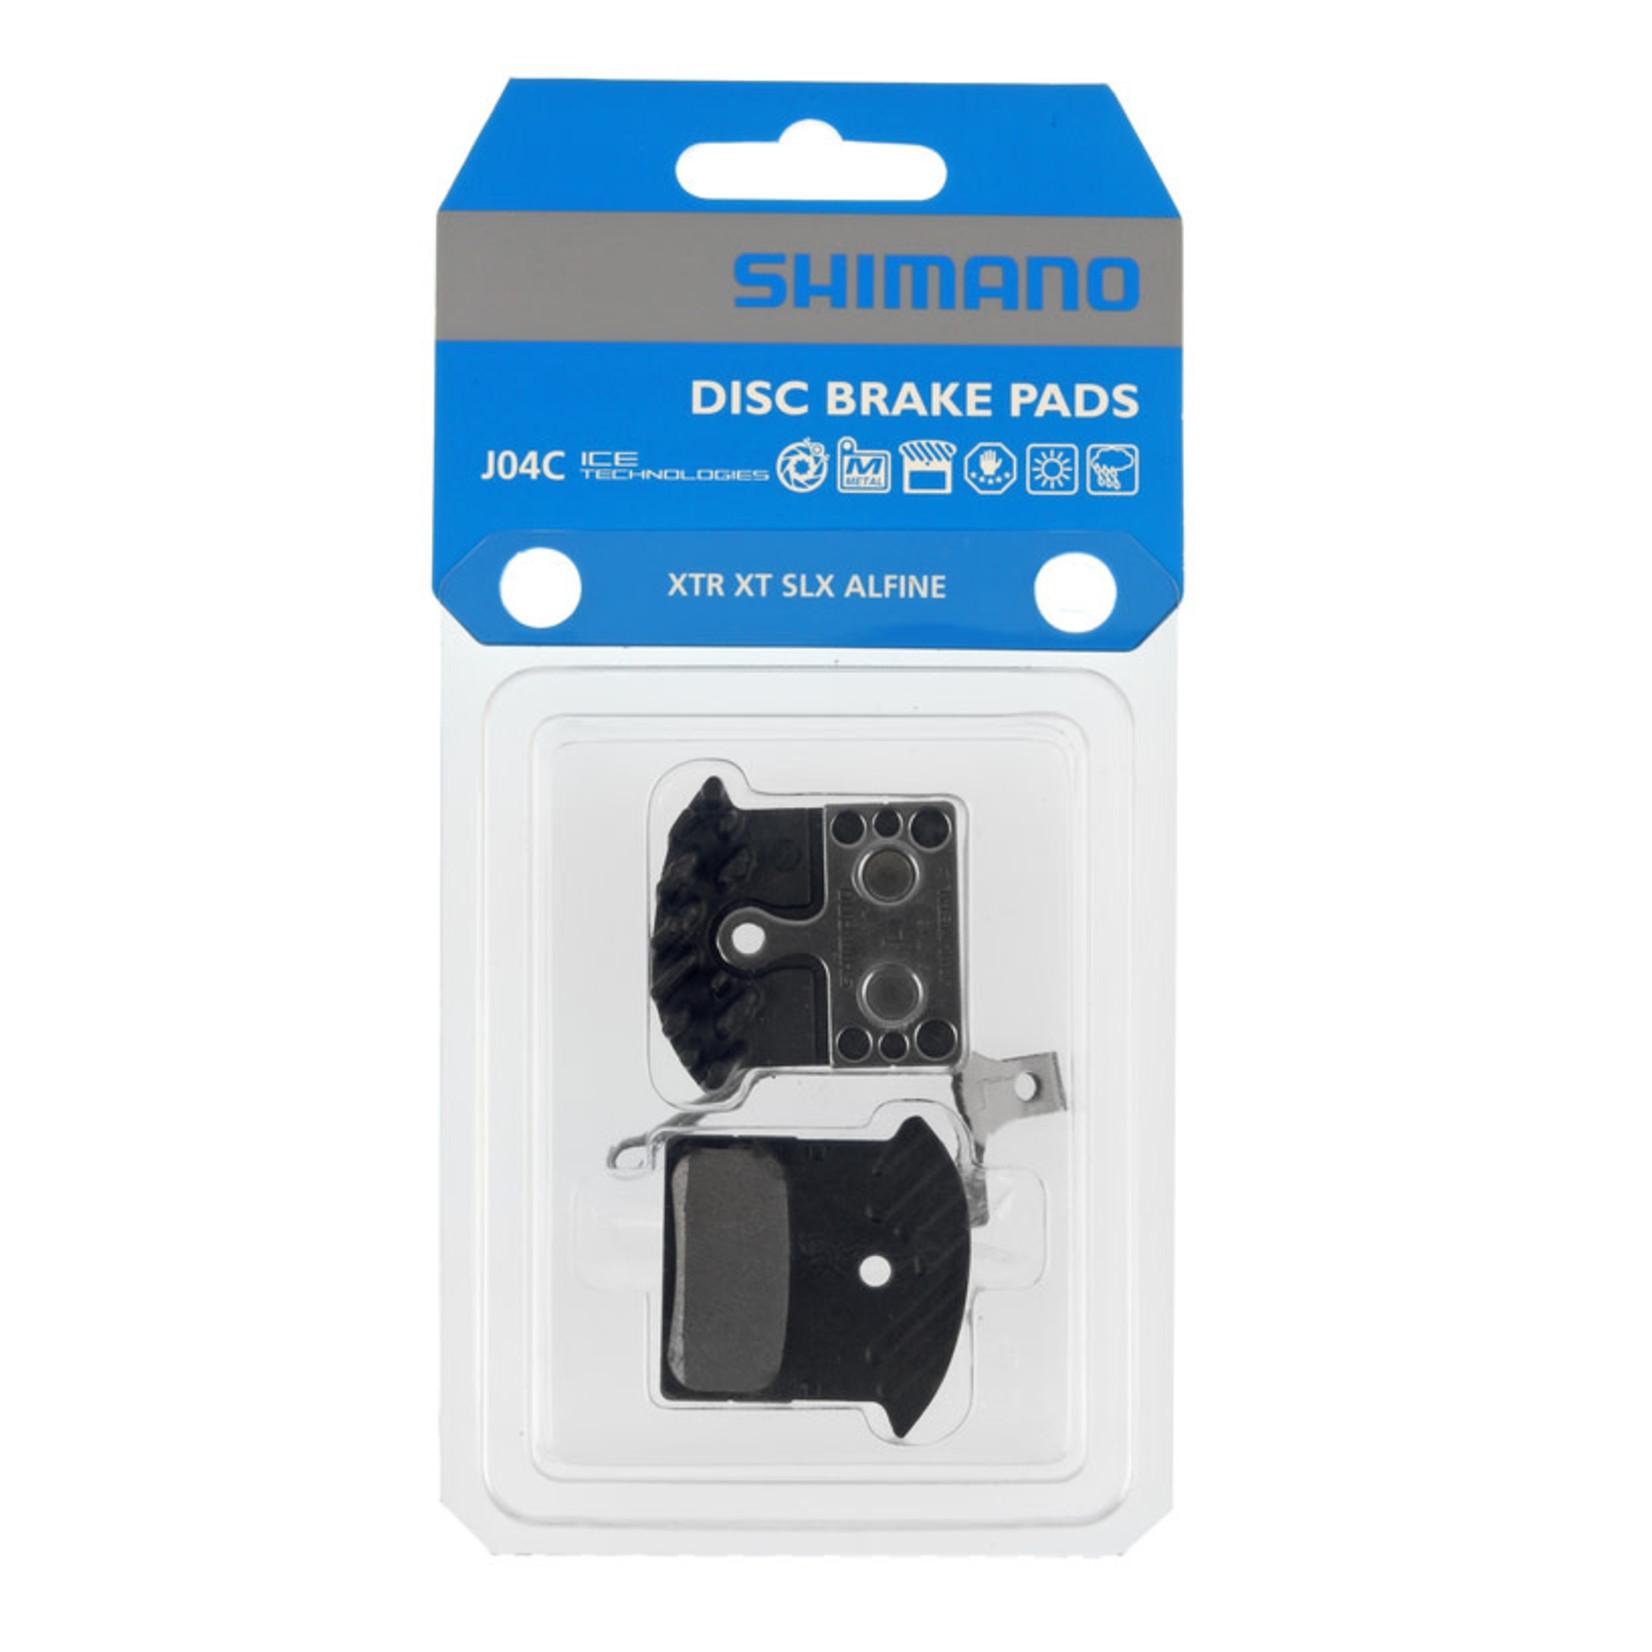 Shimano Shimano J04C Disc Brake Pads, Metal w/fin